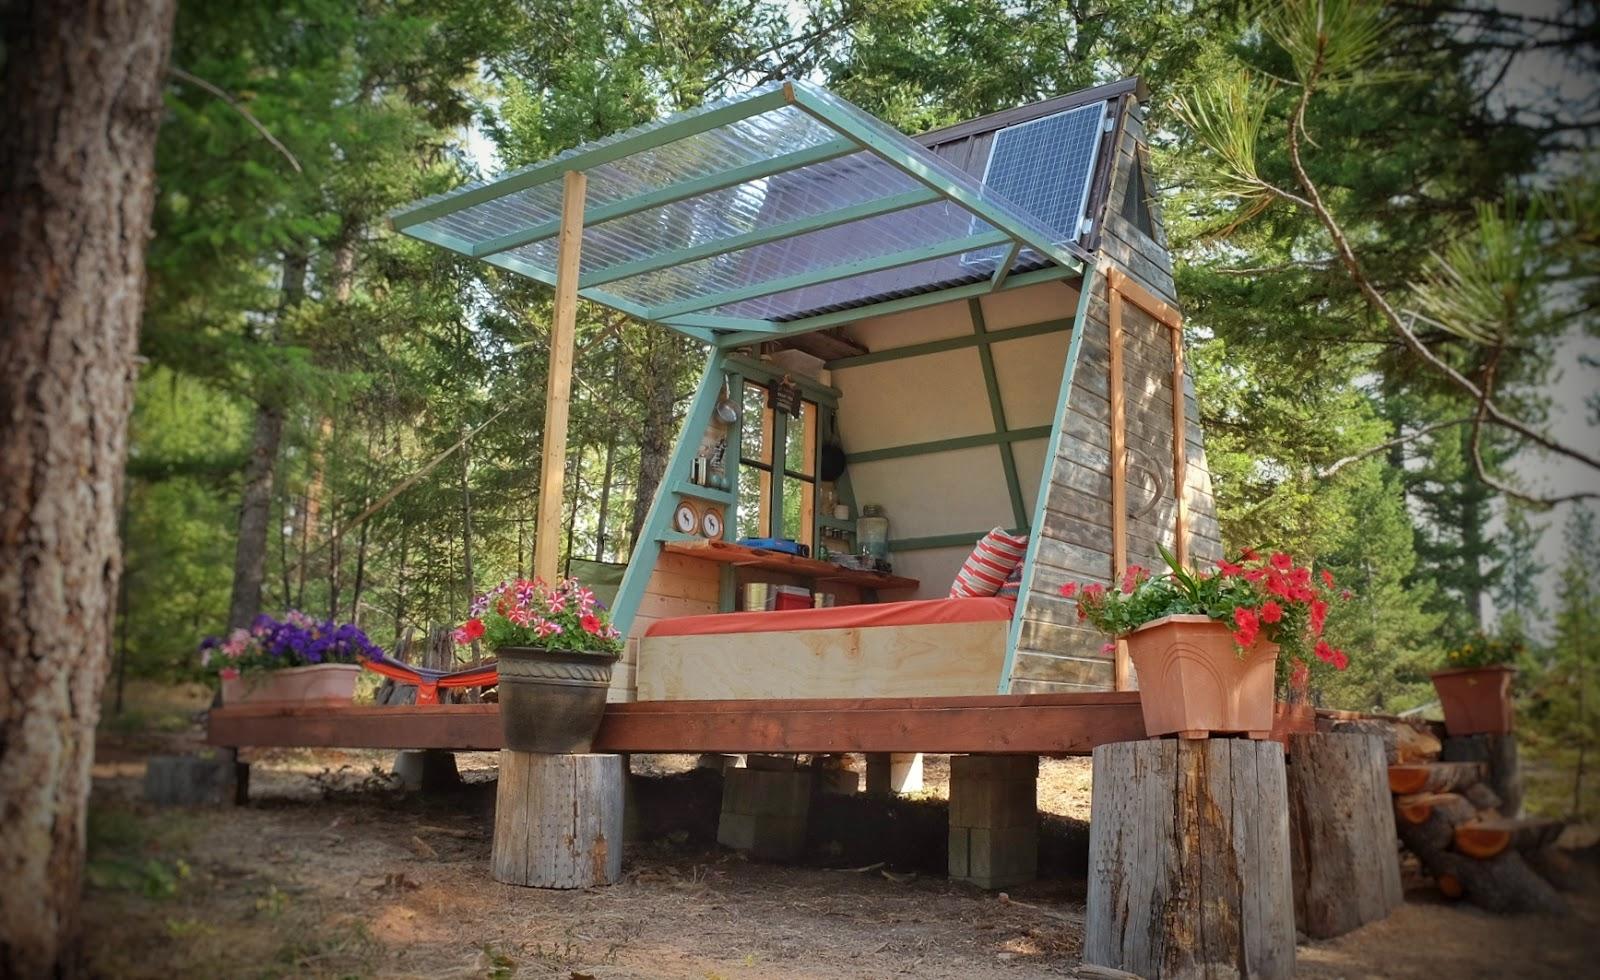 Mini Greenhouse Diy Small Spaces